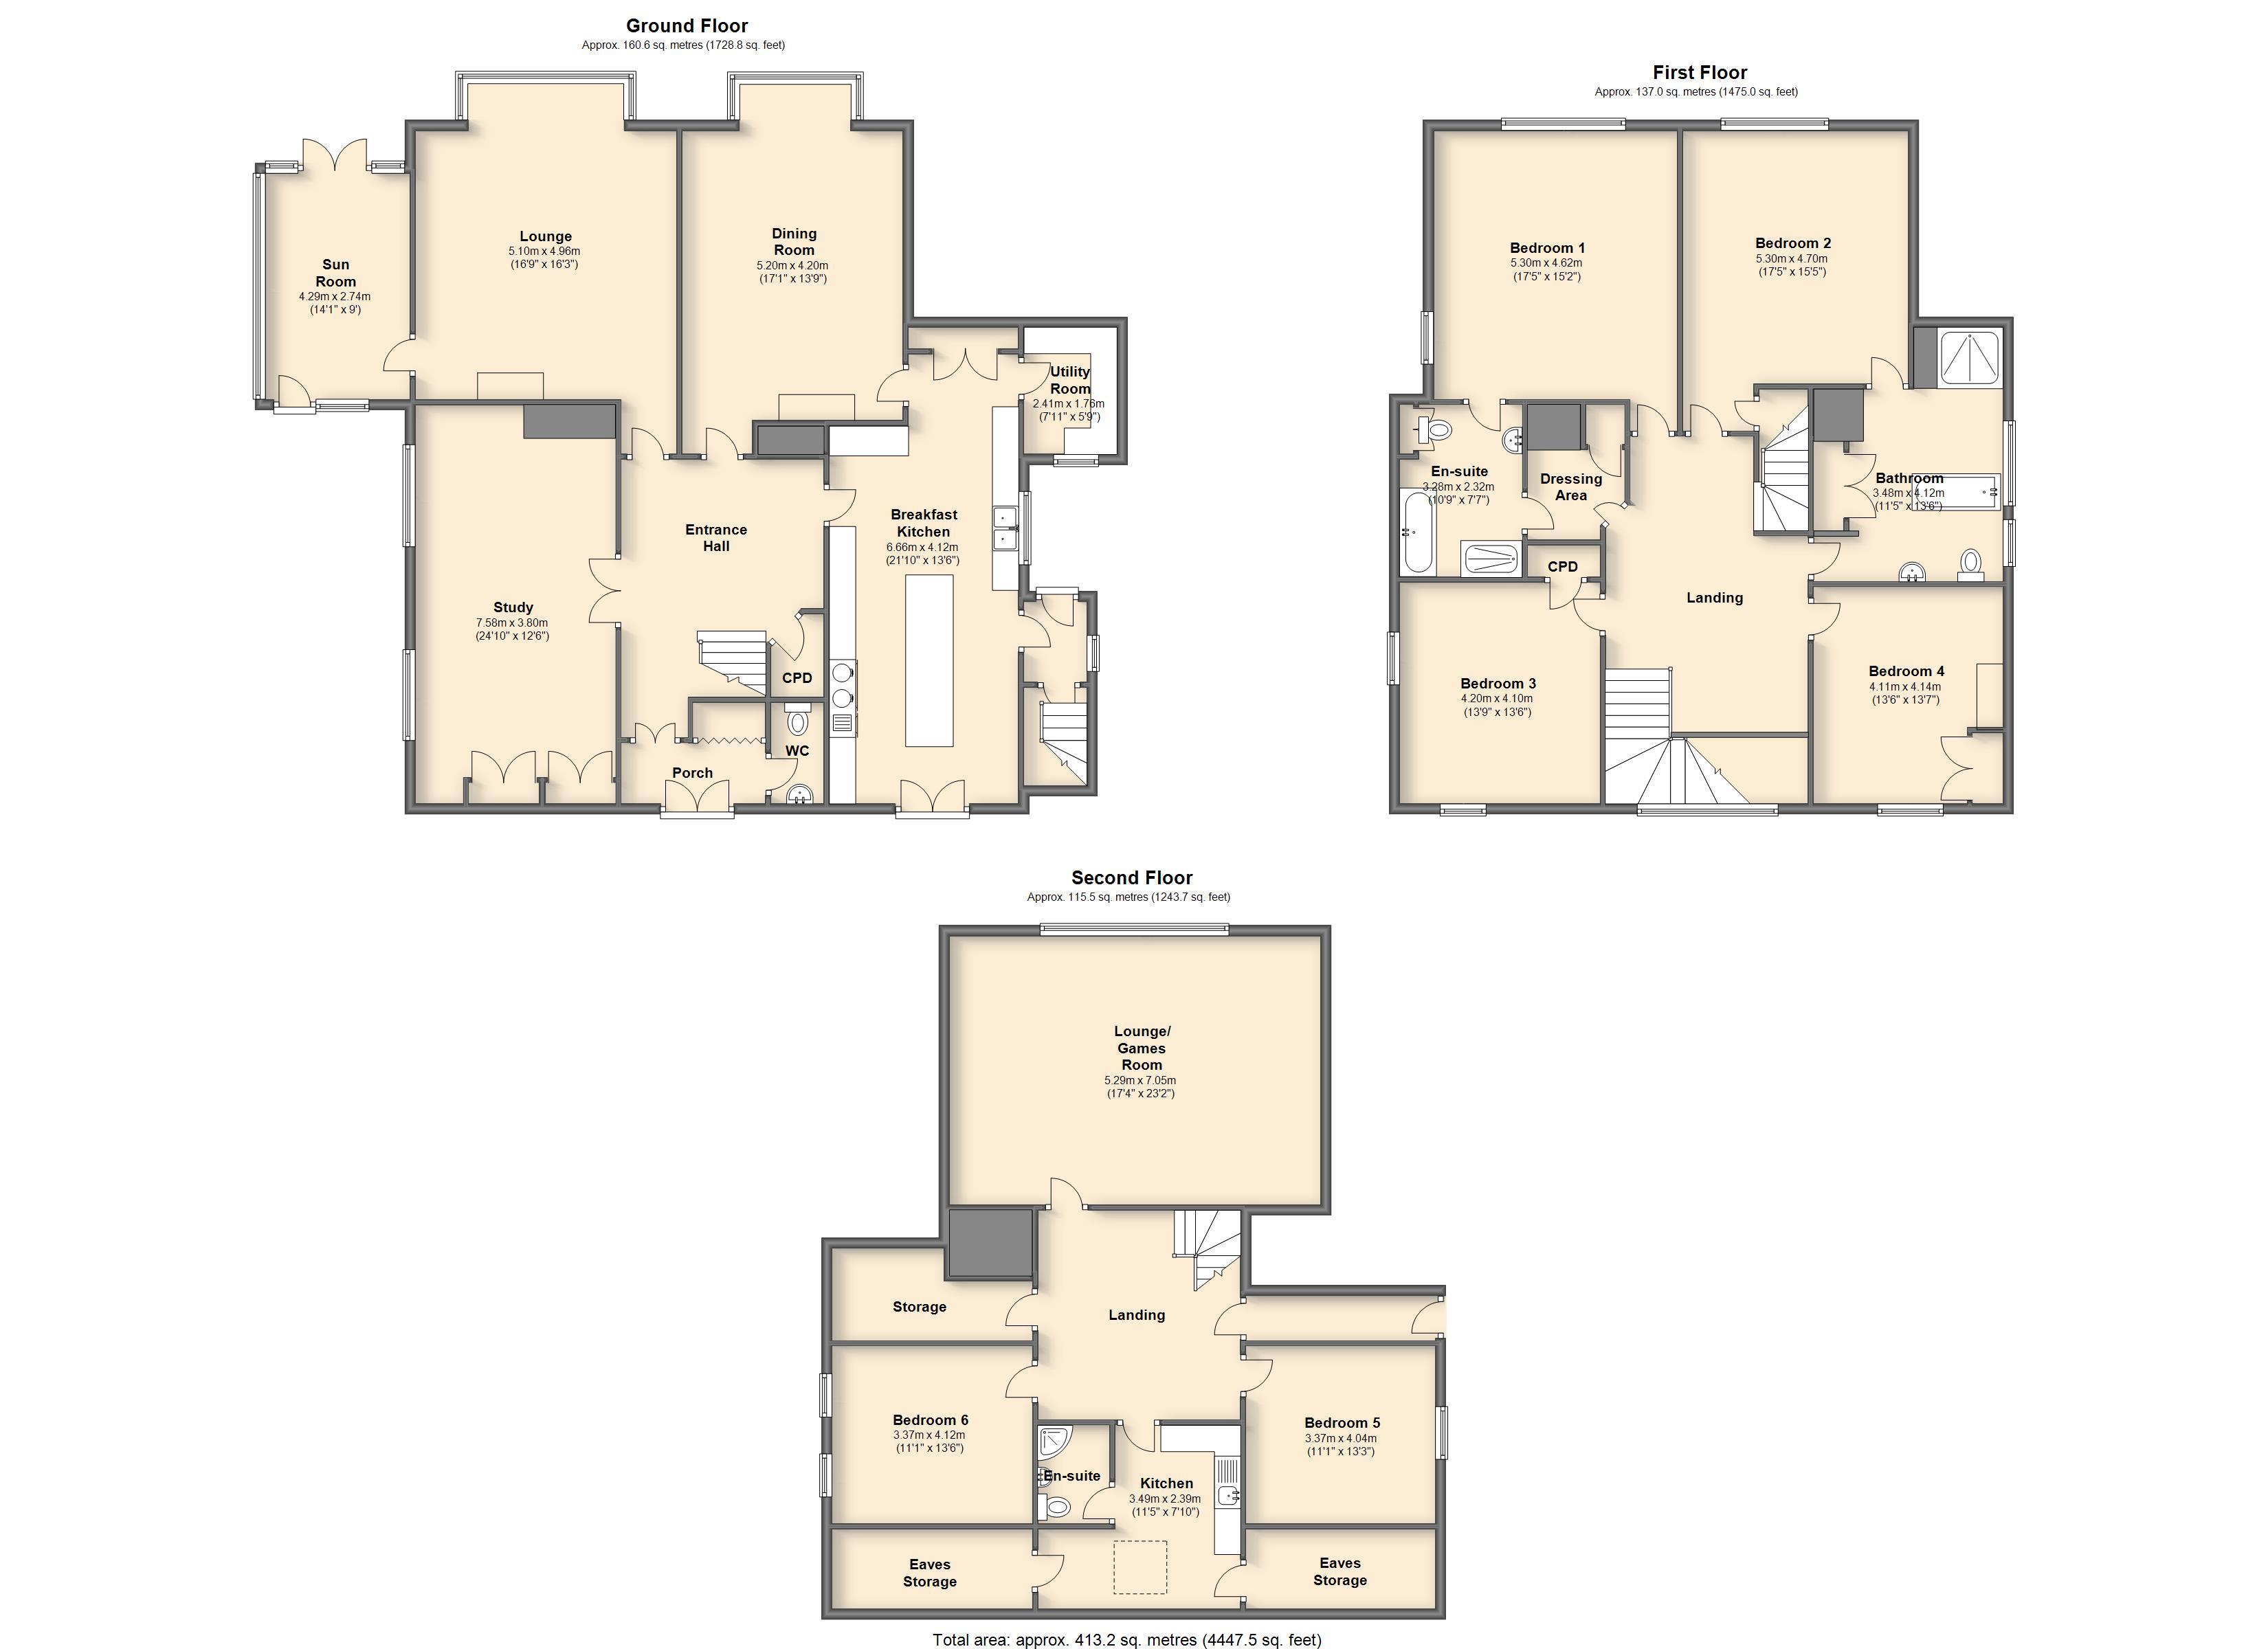 Whiteley wood road sheffield s11 7 bedroom detached for Sheffield floor plan